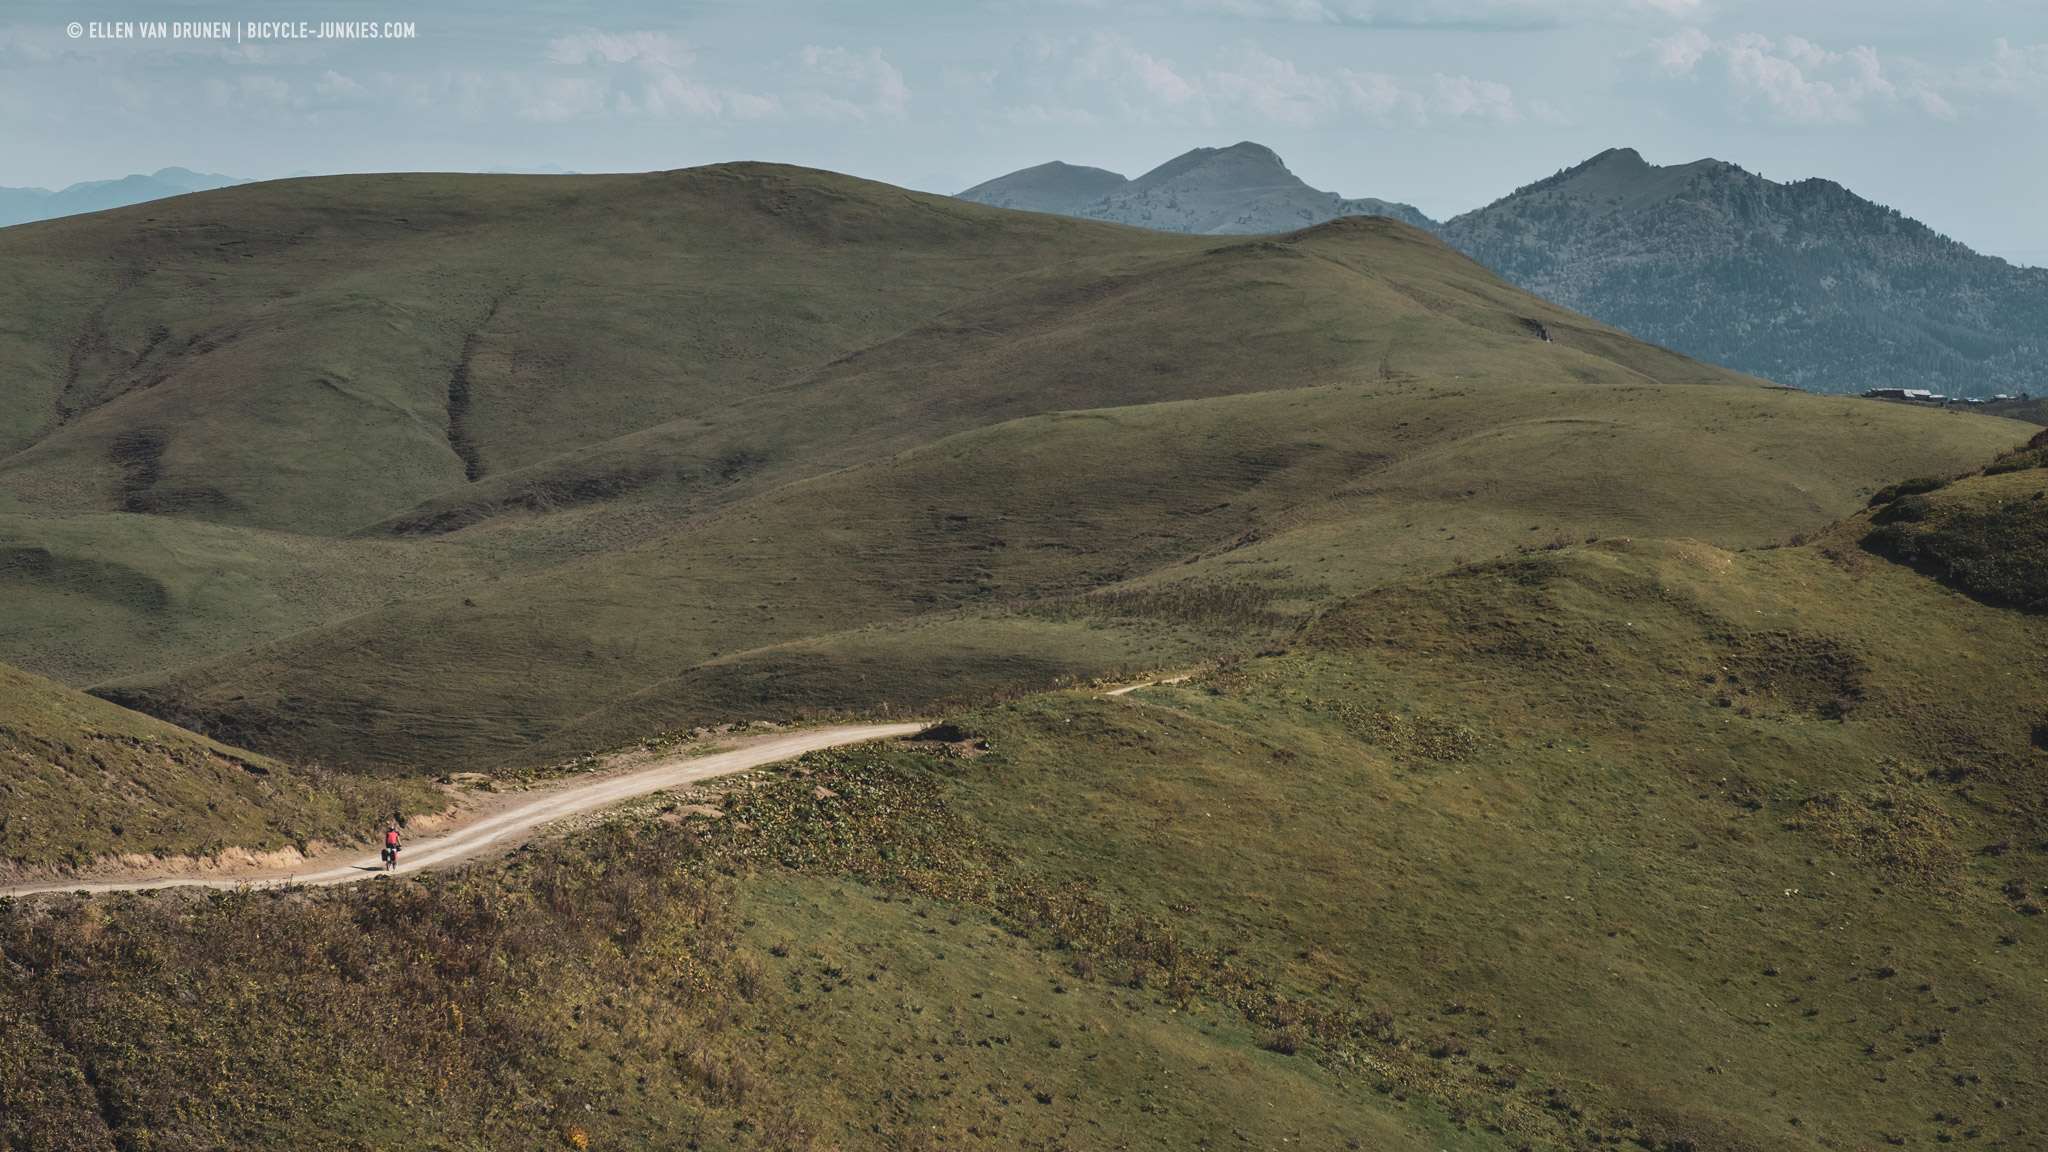 Downhill to Abastumani